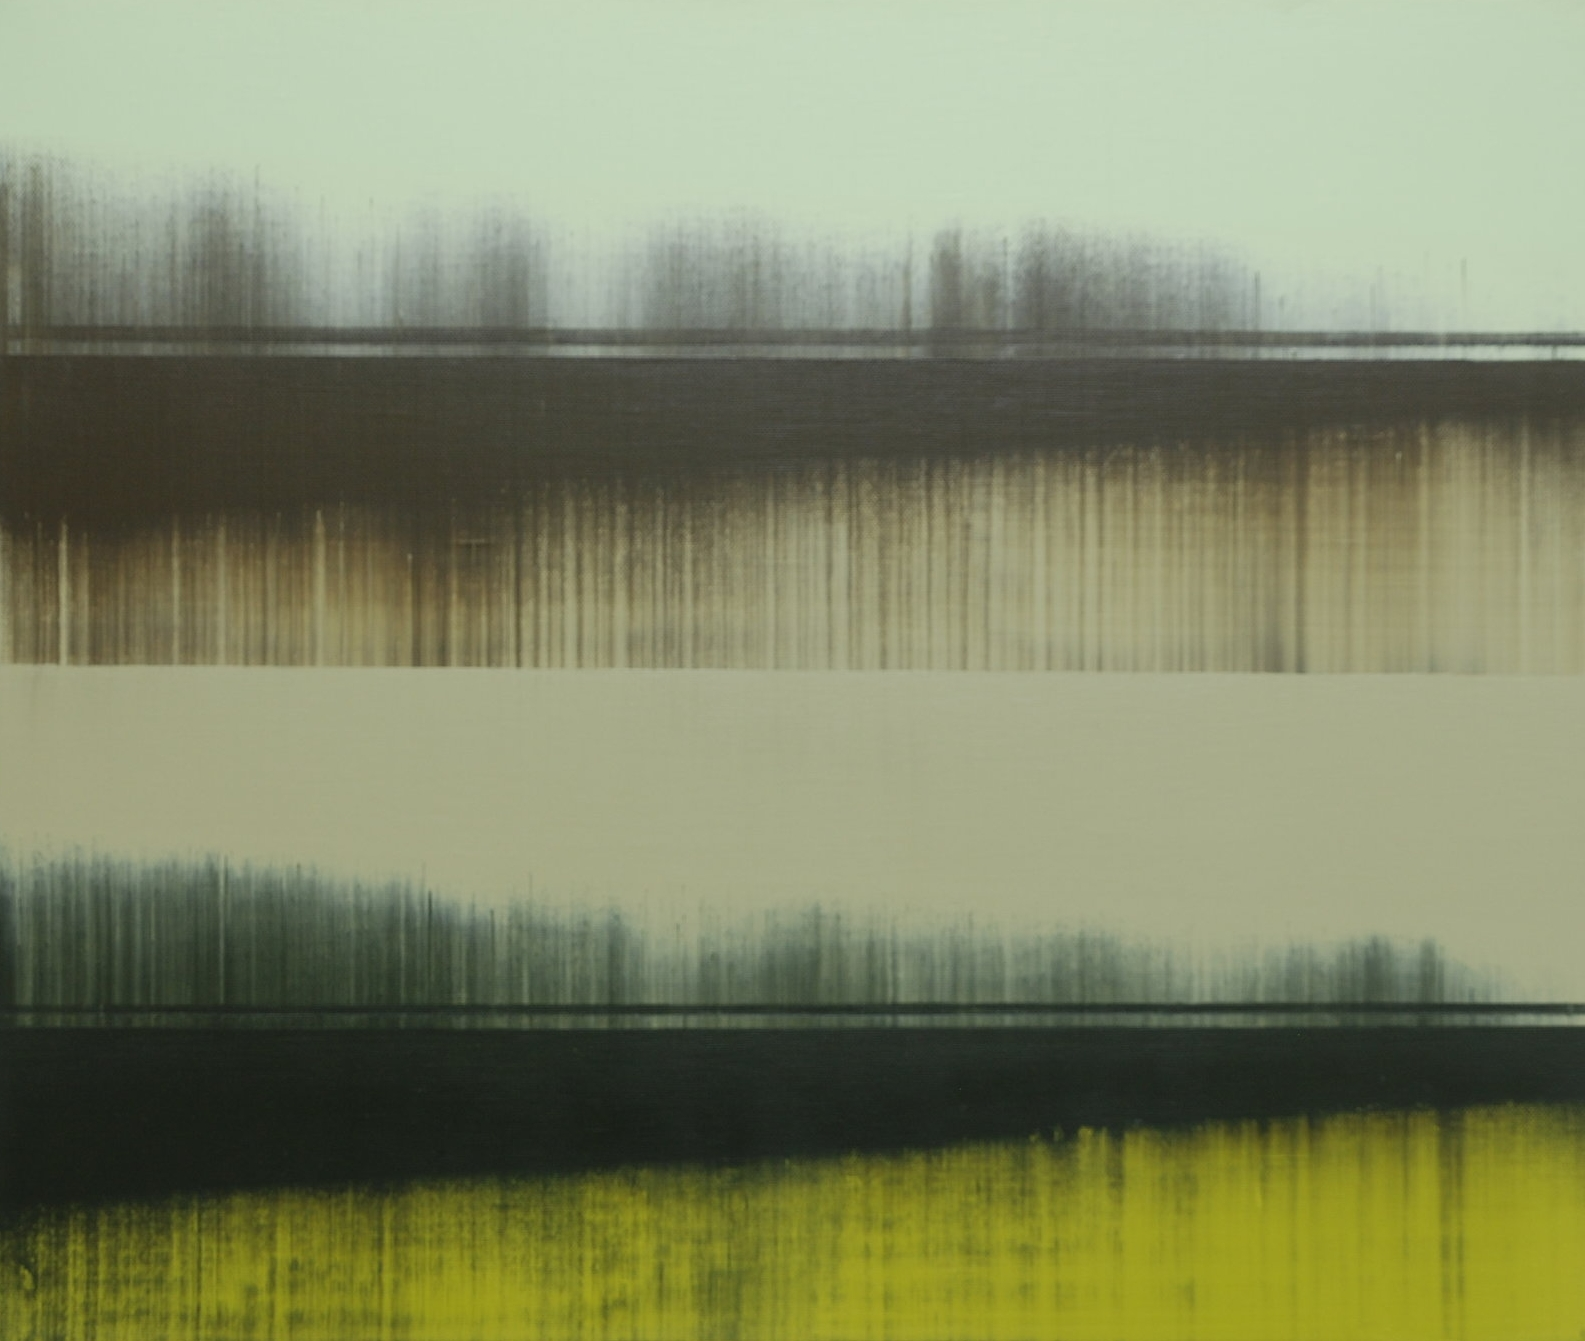 Parallel Terrain xi | 60cm x 50cm Oil on Canvas